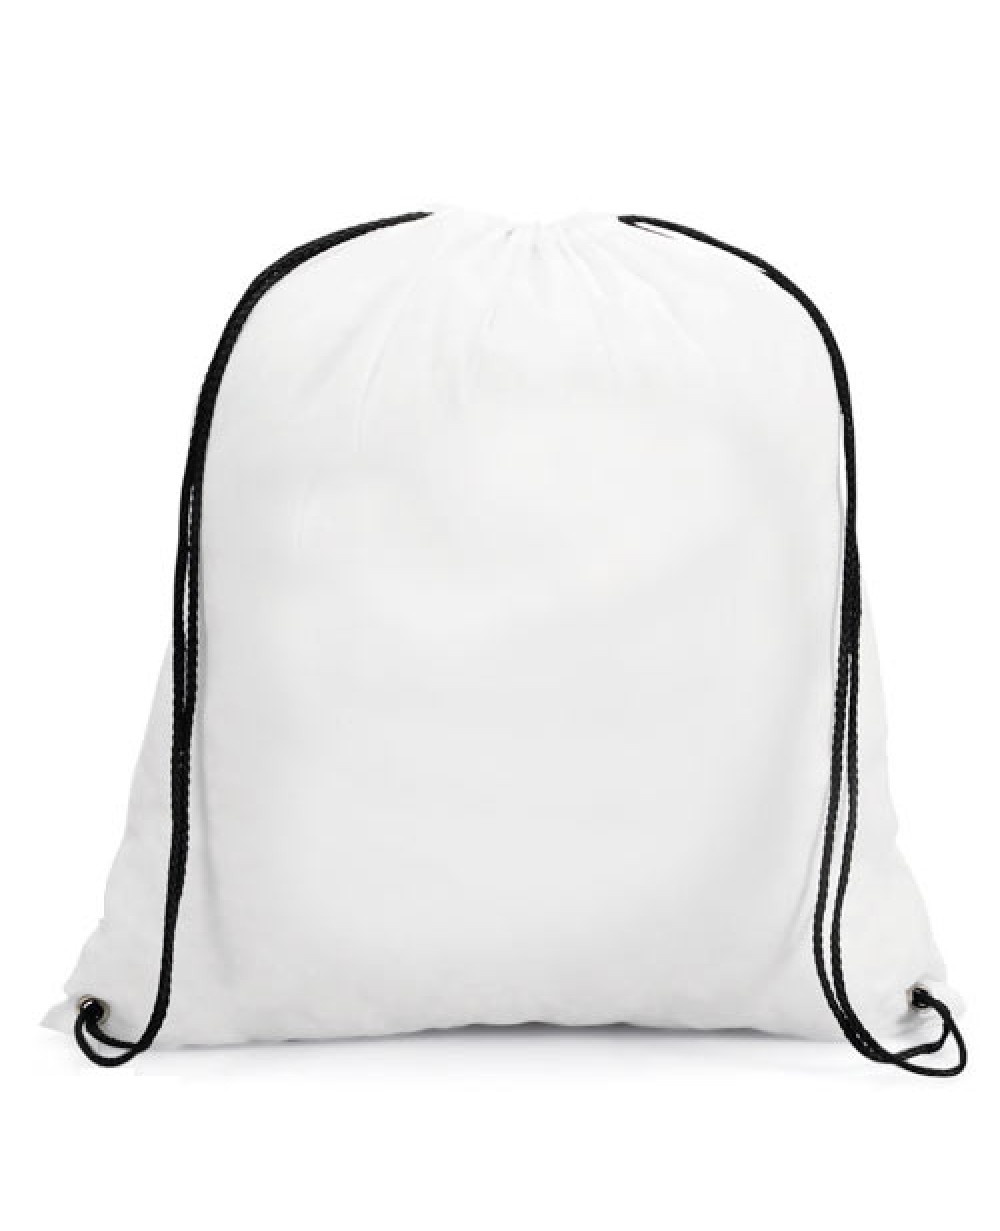 c7b8e90f56f8 Sublimation School or Gym Bag Supplier of Blanks